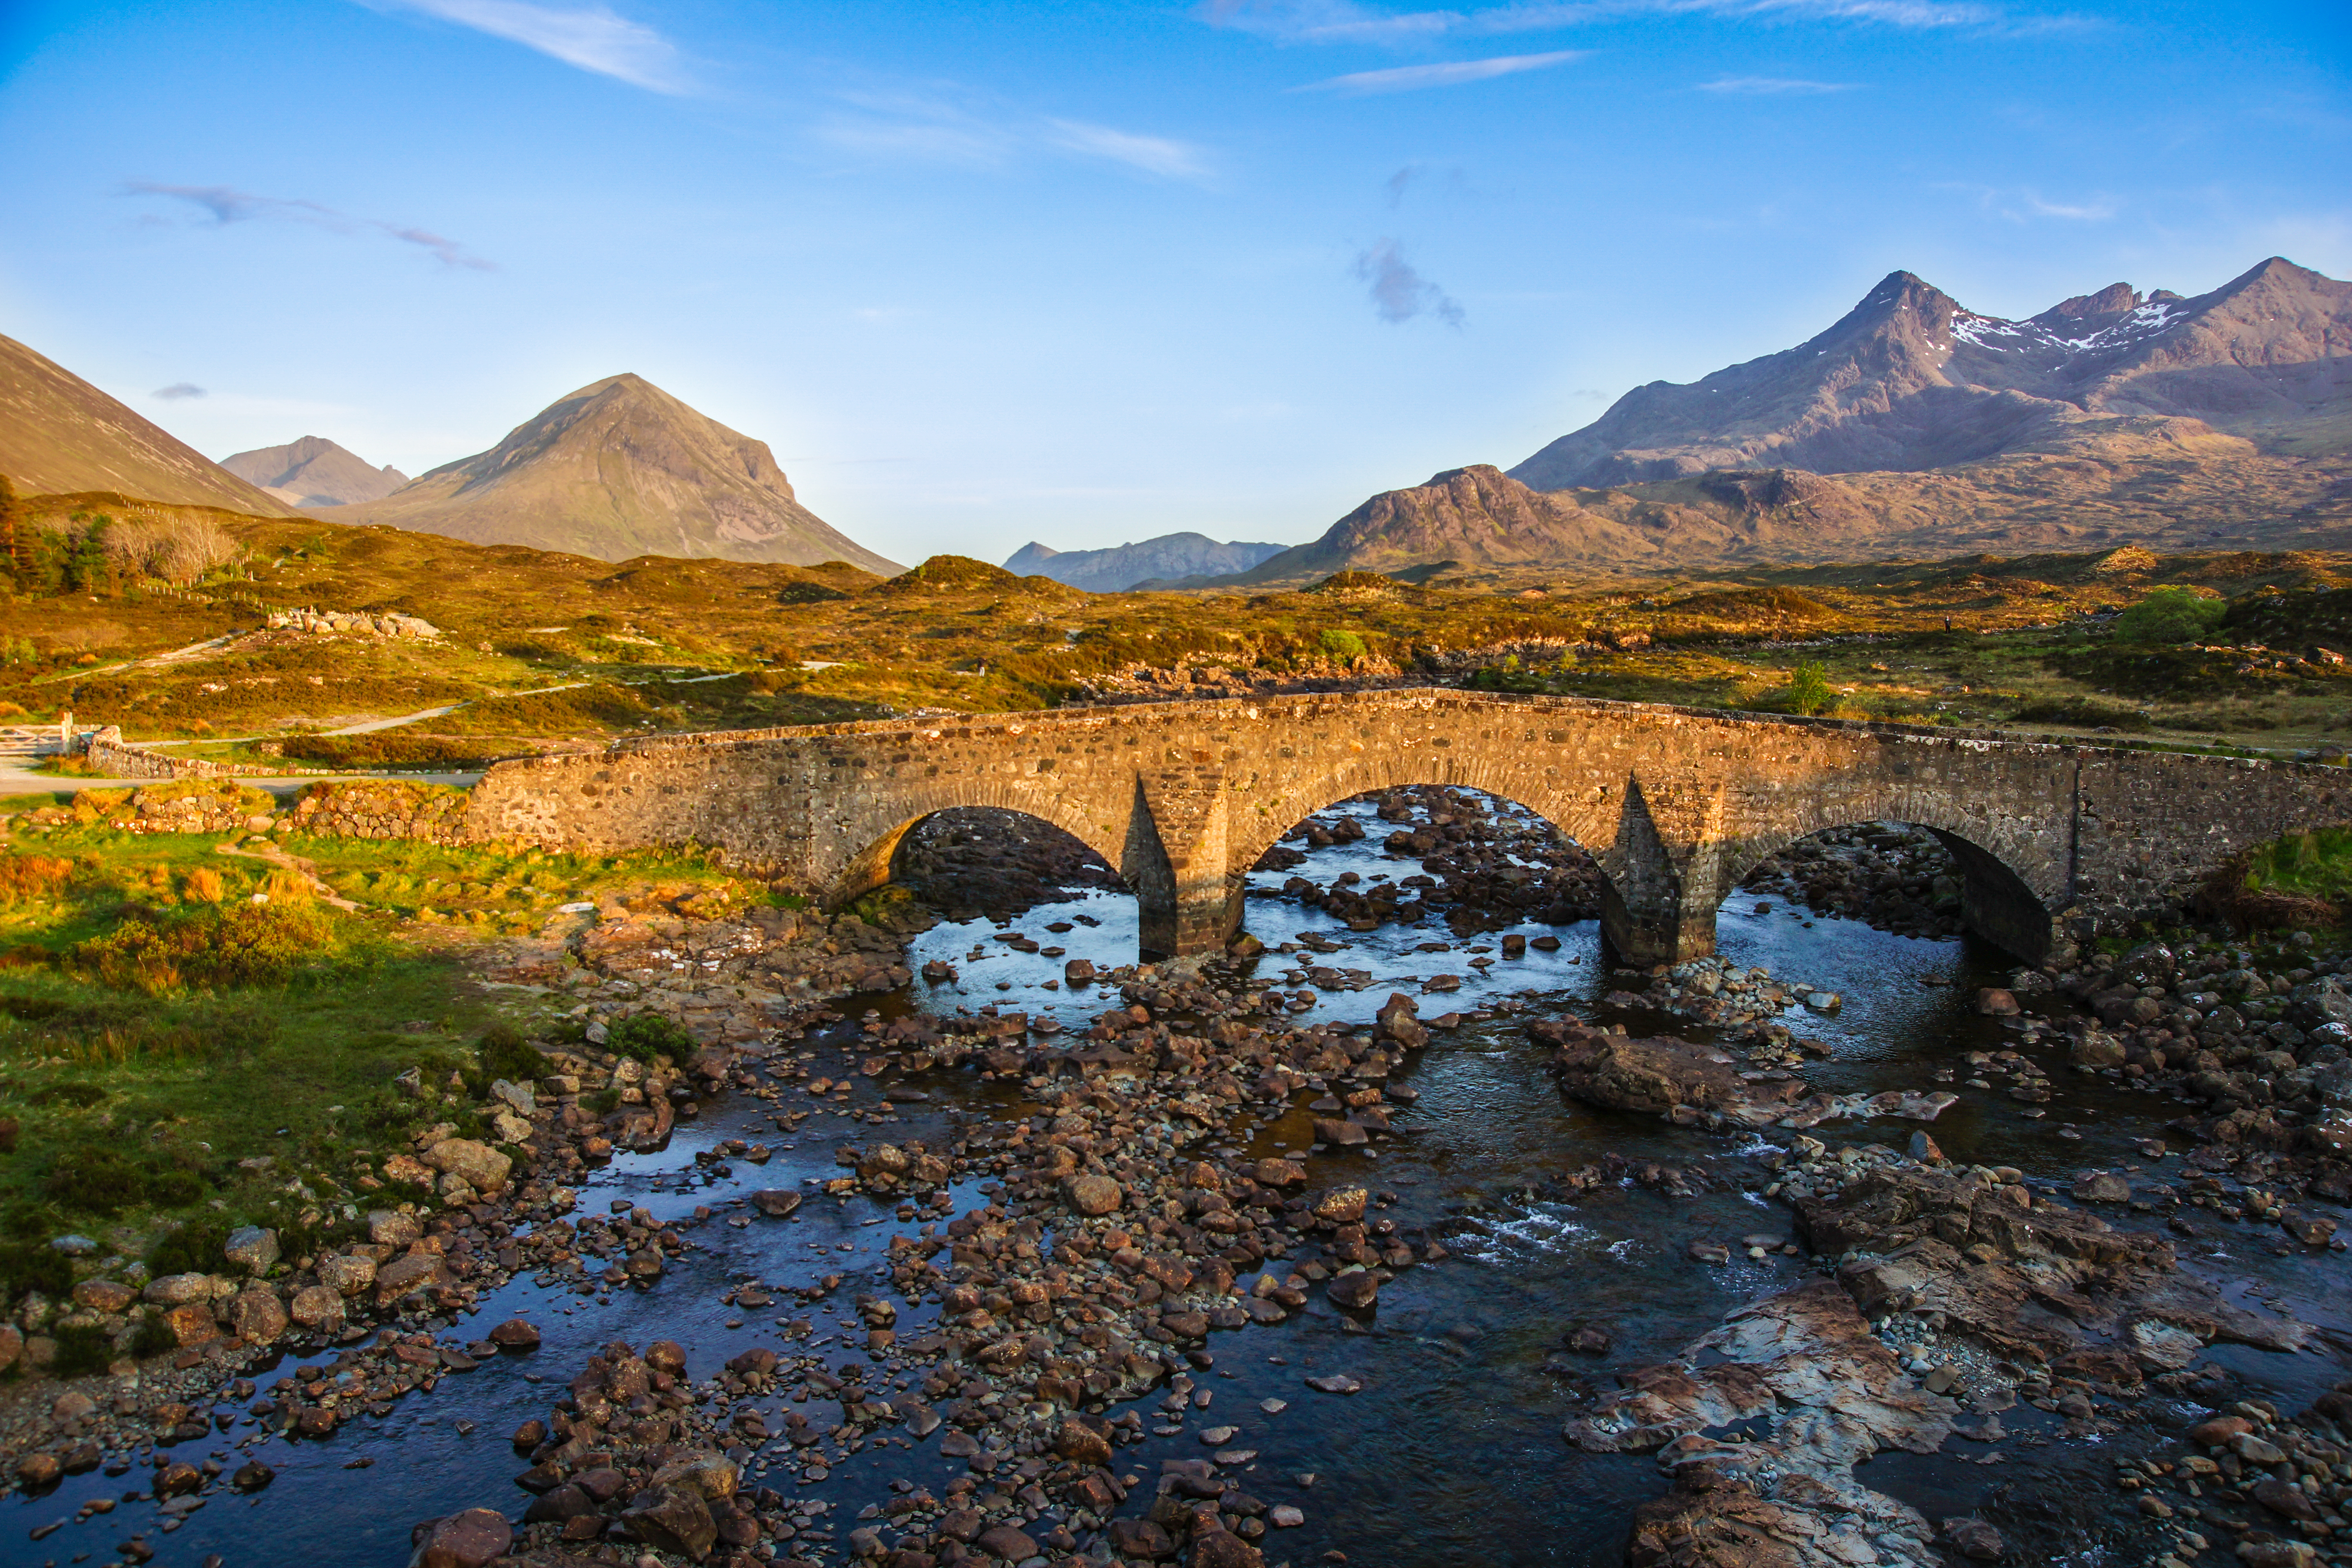 Skye Trail – Etappe 4